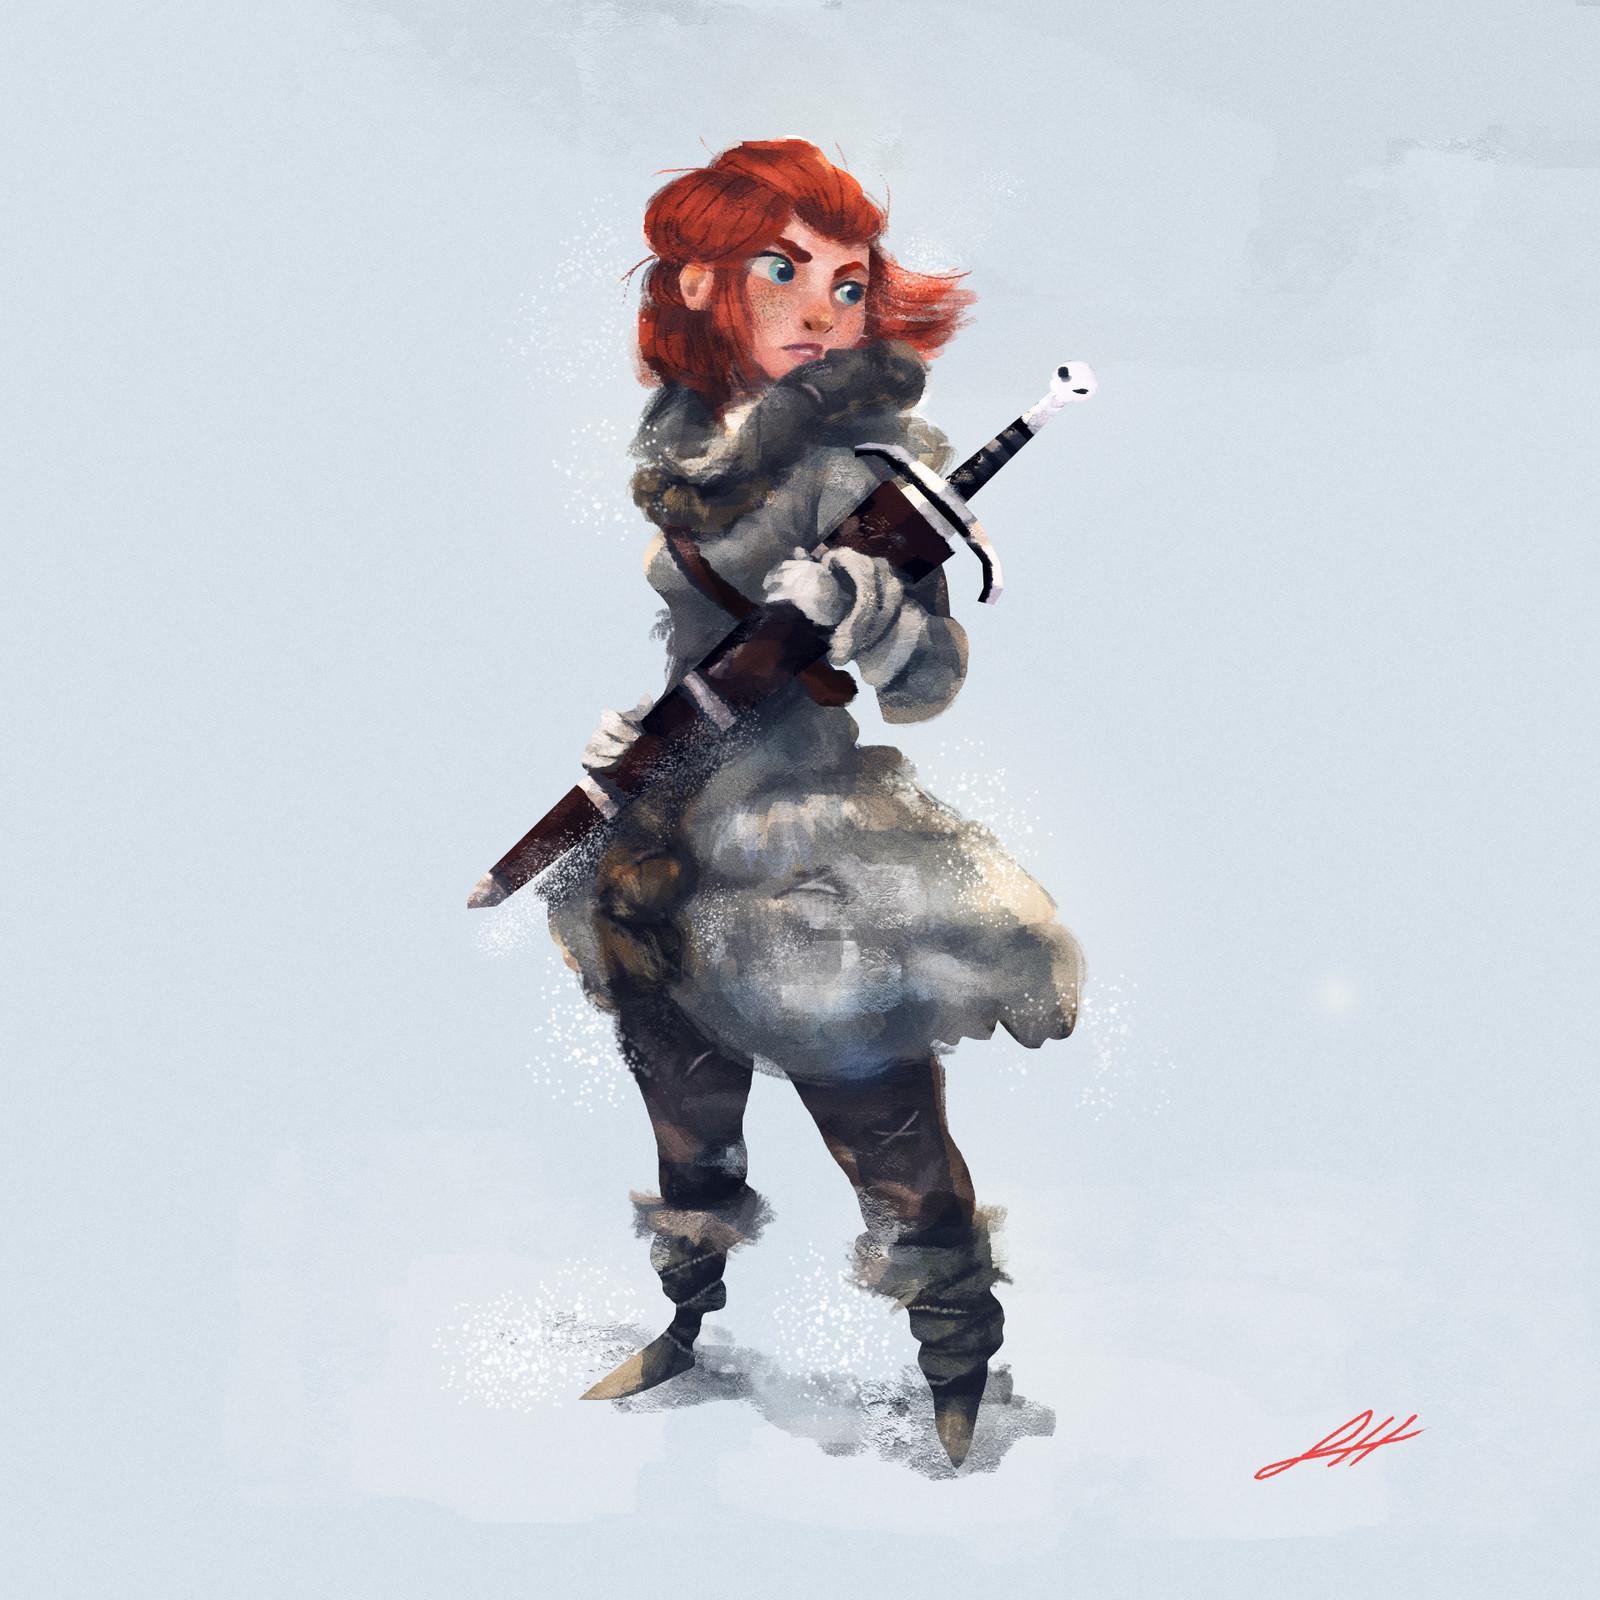 Ygritte